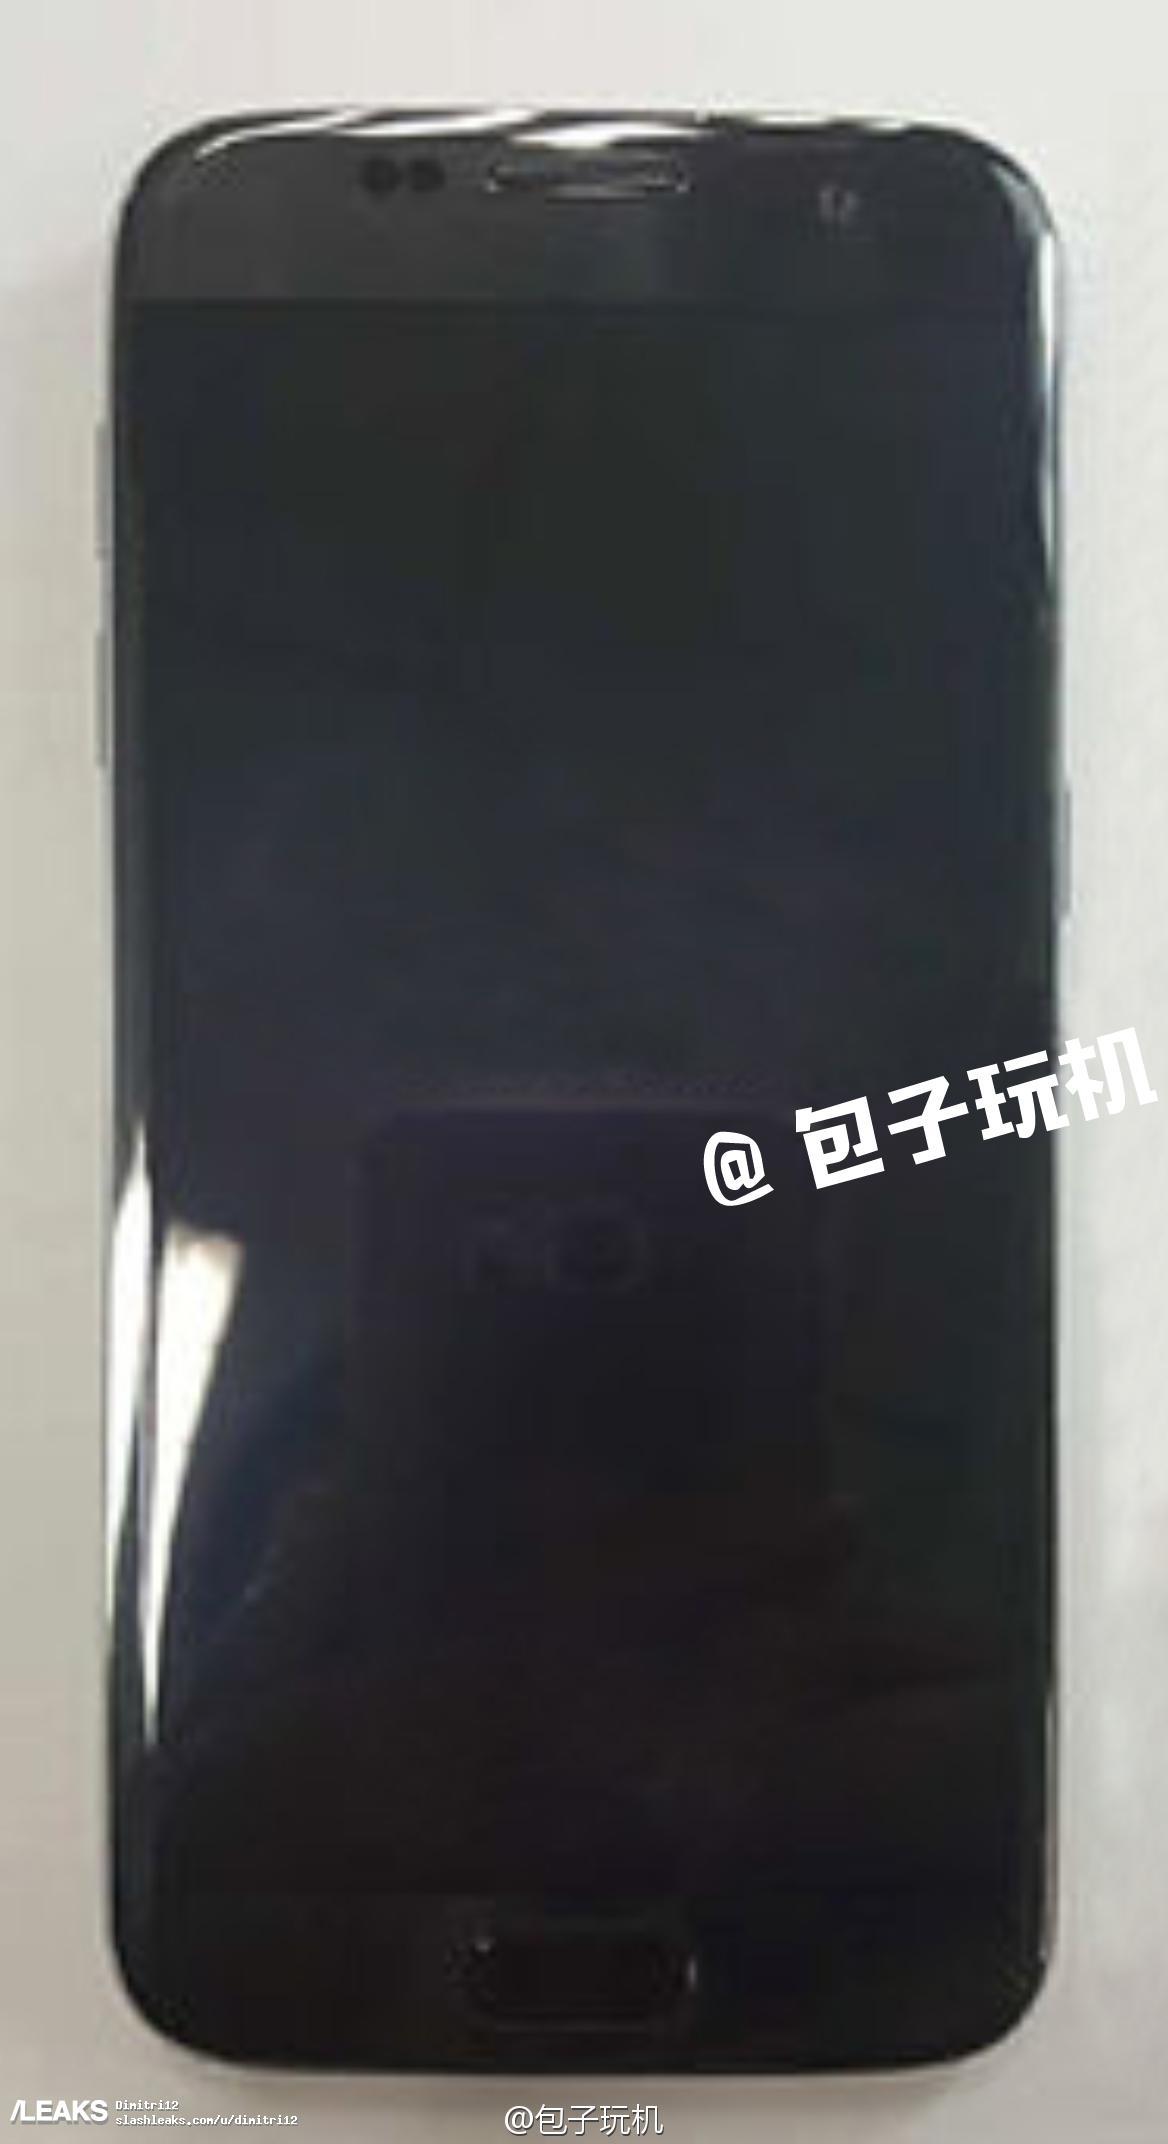 img Samsung Galaxy S7 edge leaks in black